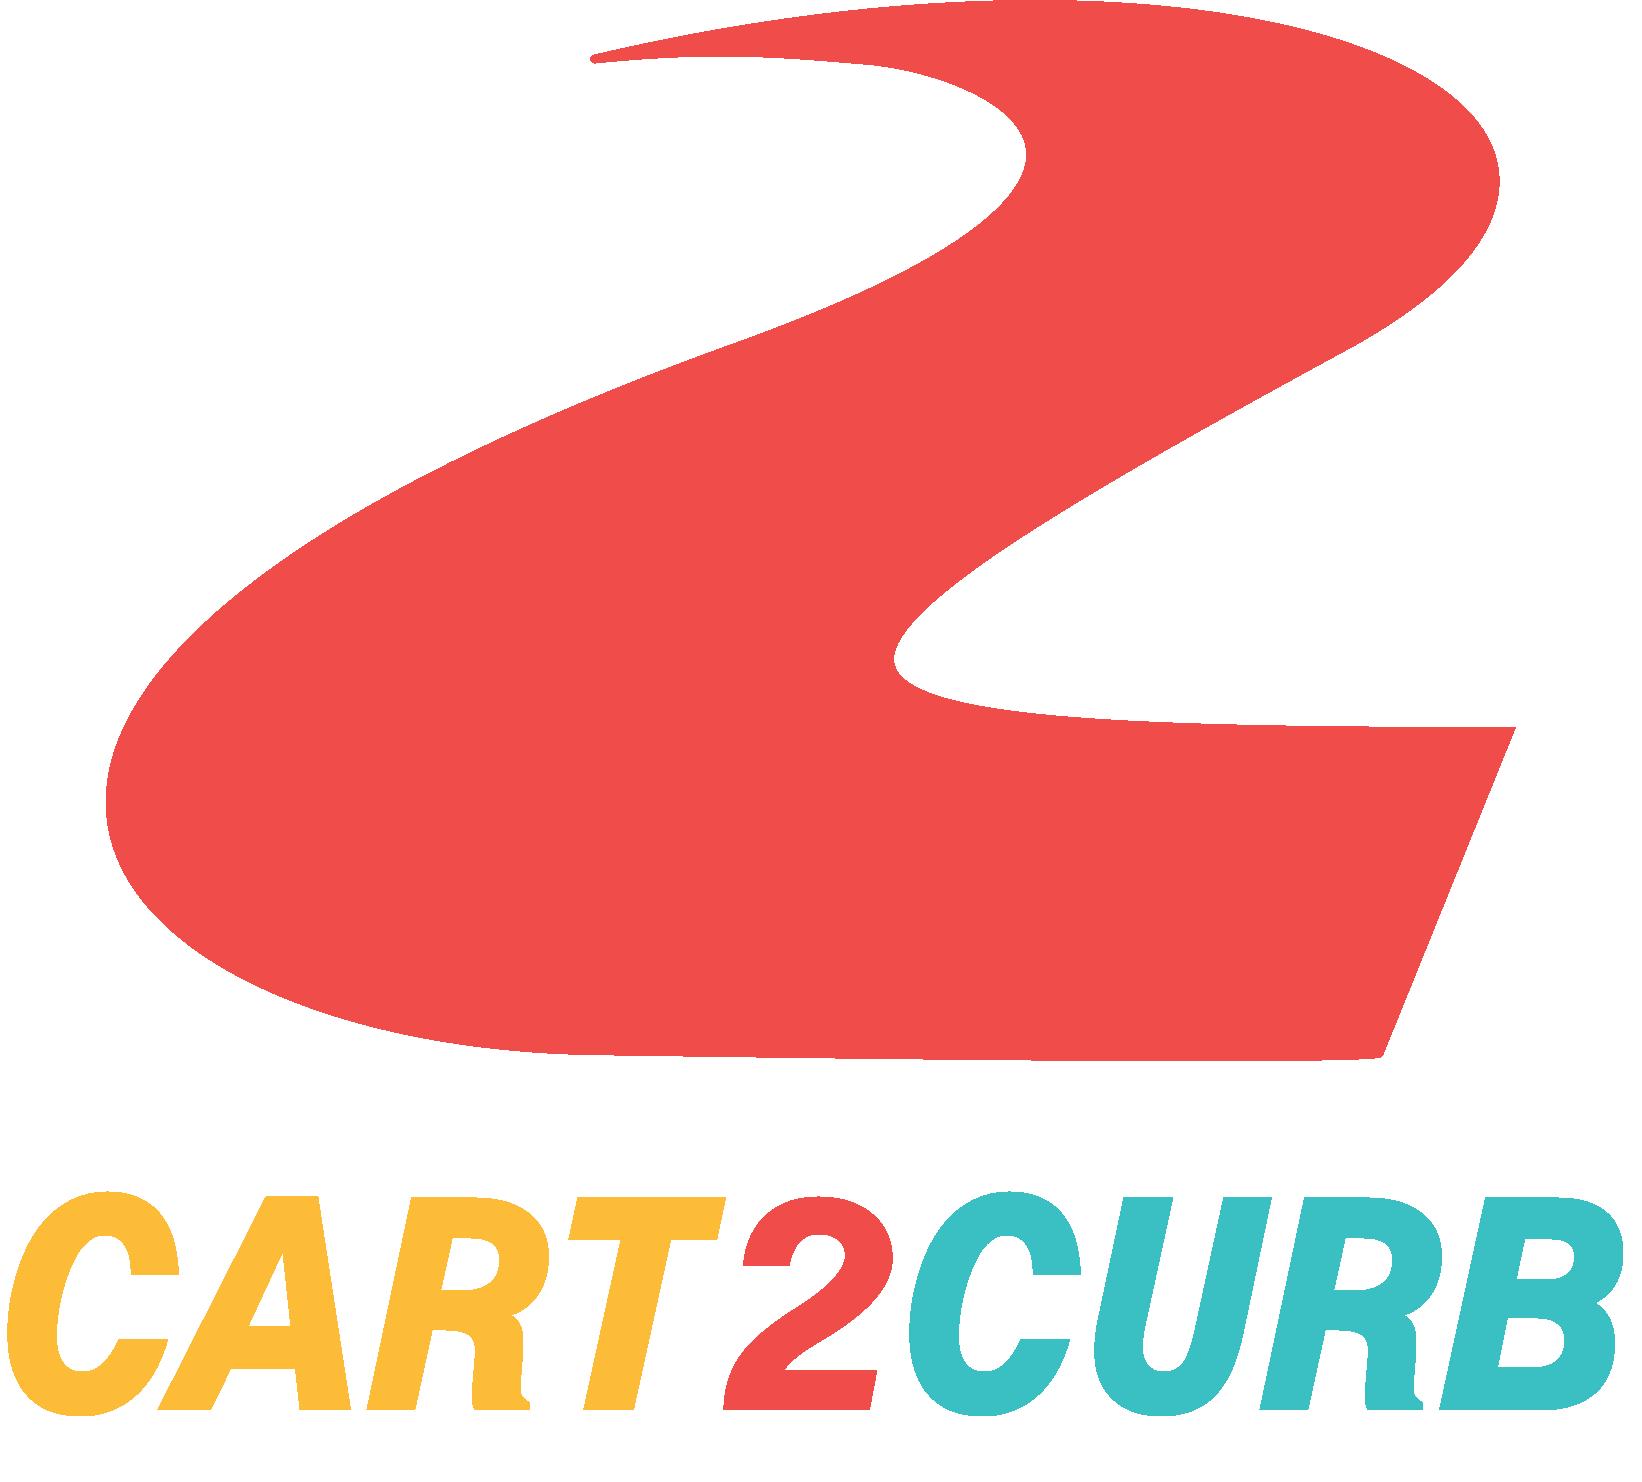 cart2curb